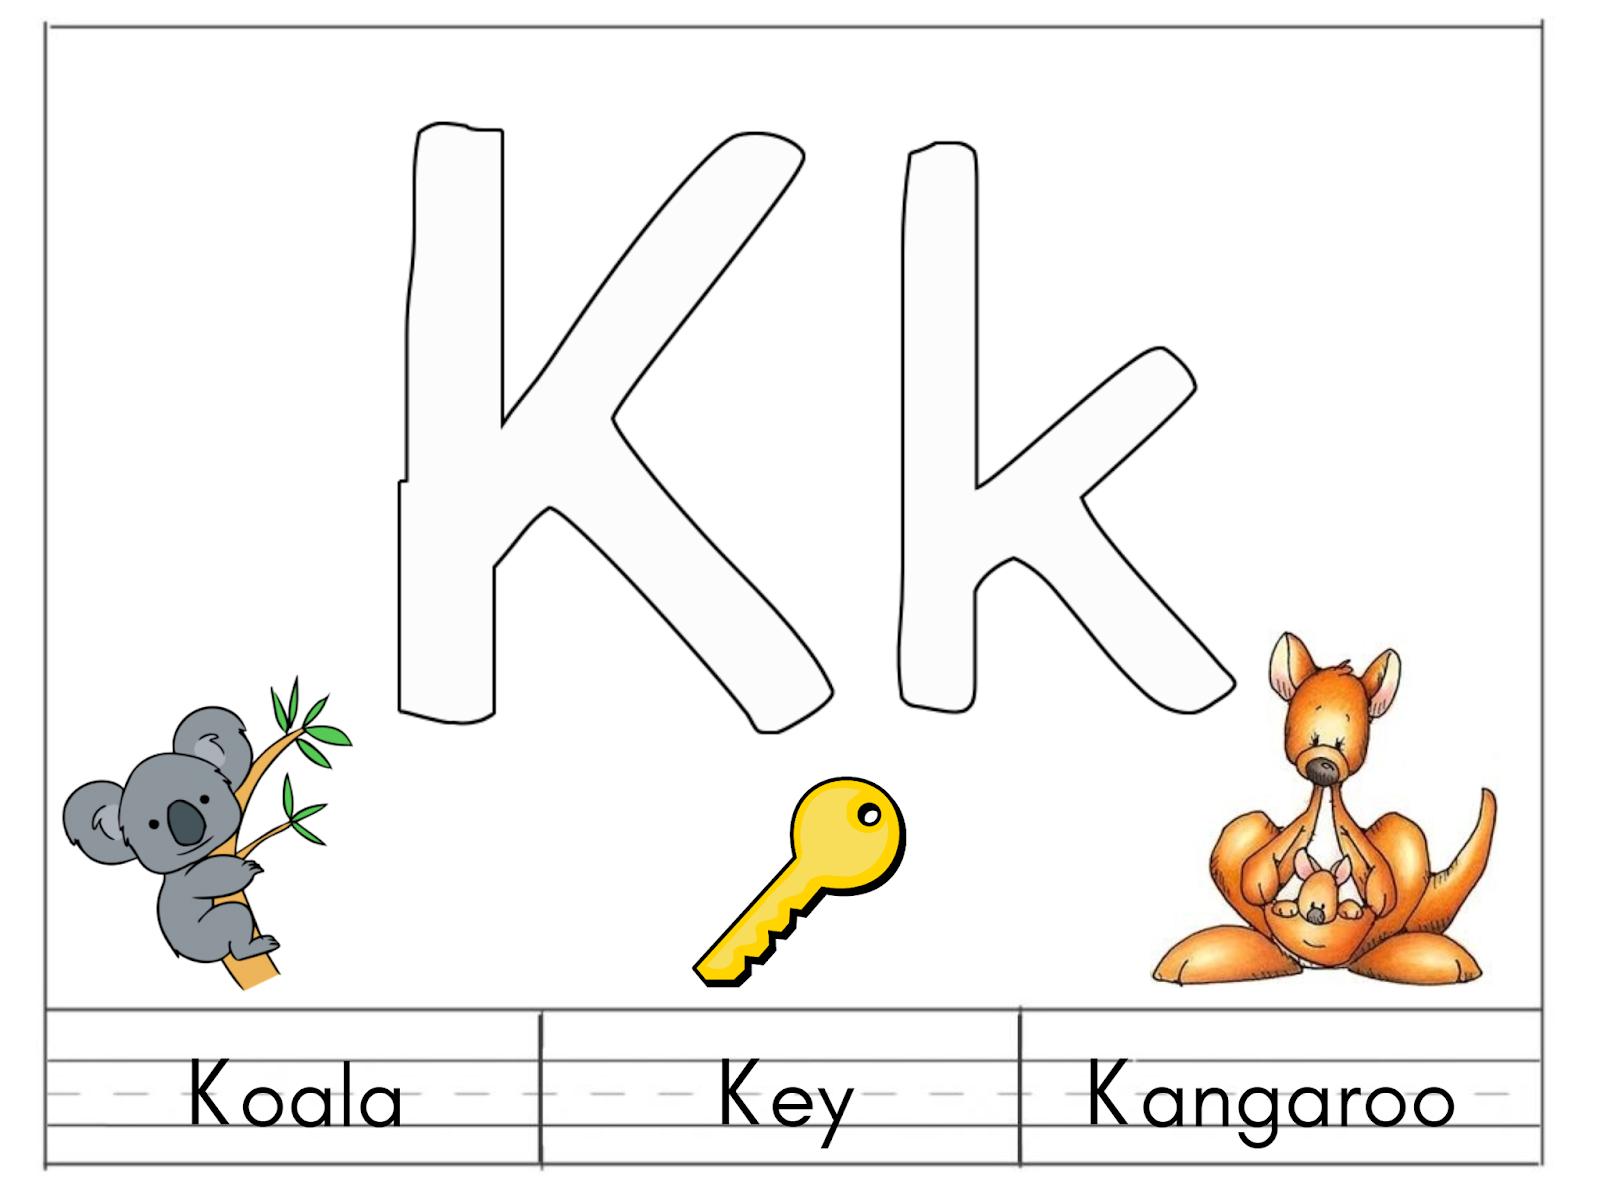 صورة كلمات بحرف k , صور و كلمات مزخرفه بحرف k 3731